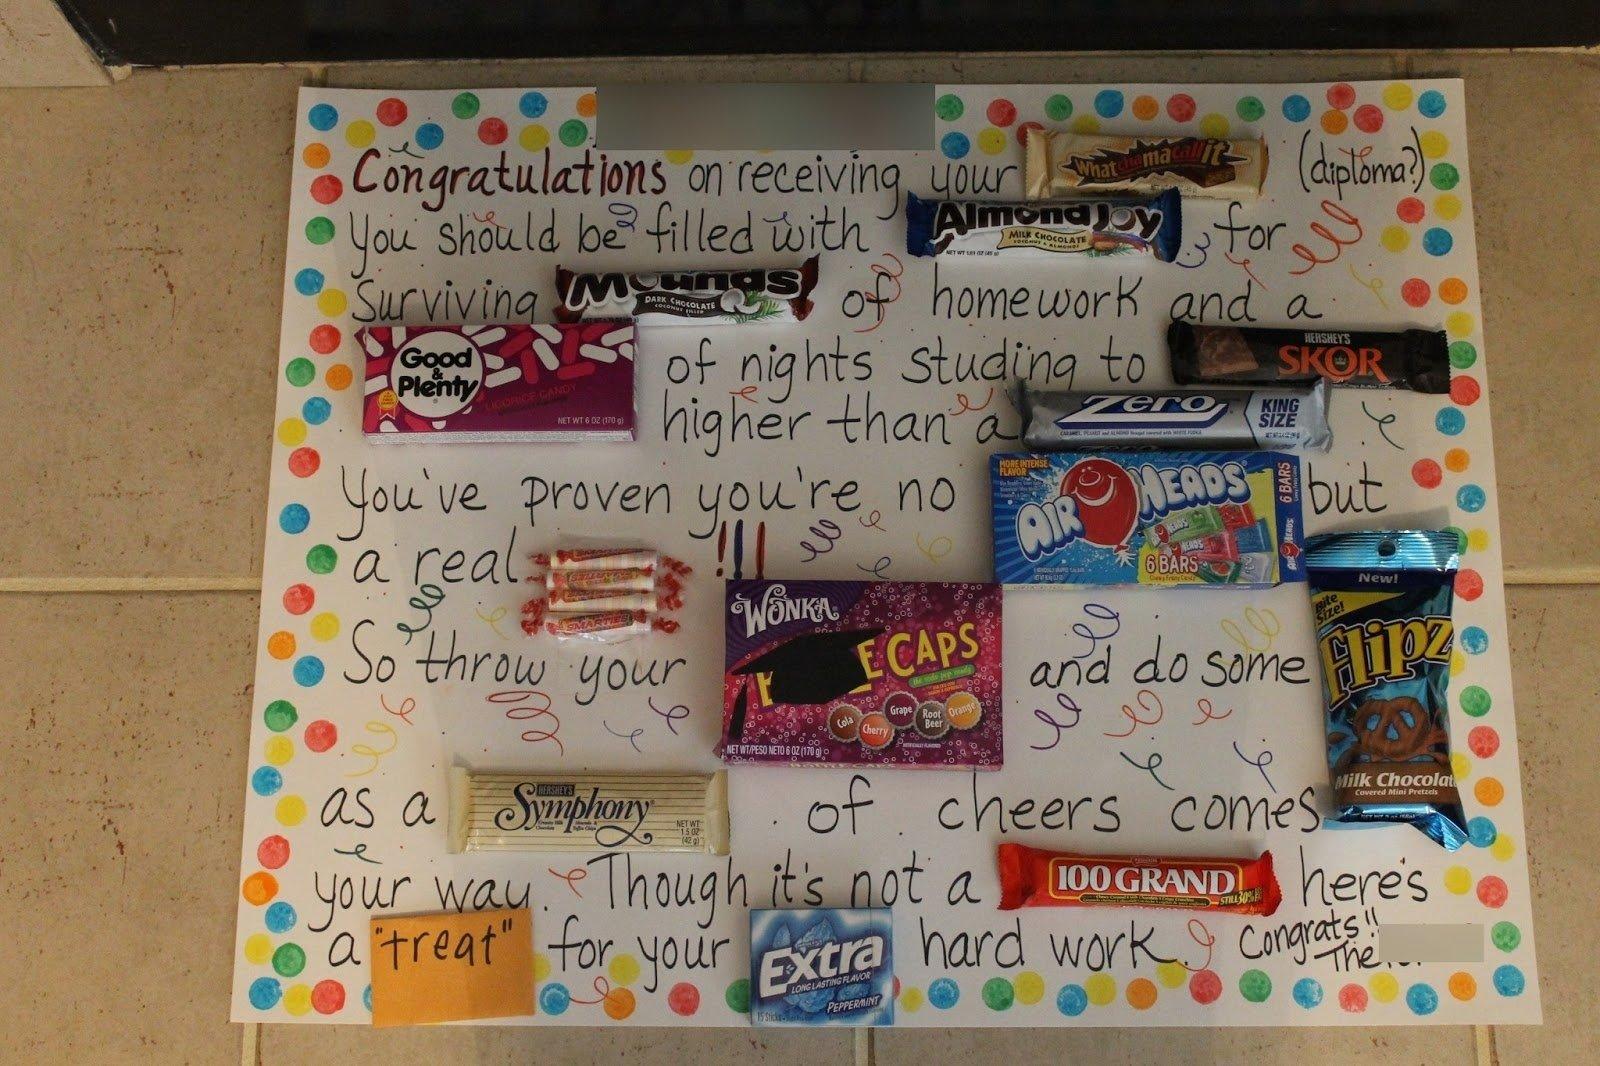 10 Wonderful Graduation Gift Ideas For Son texas decor graduation party gift ideas 2021